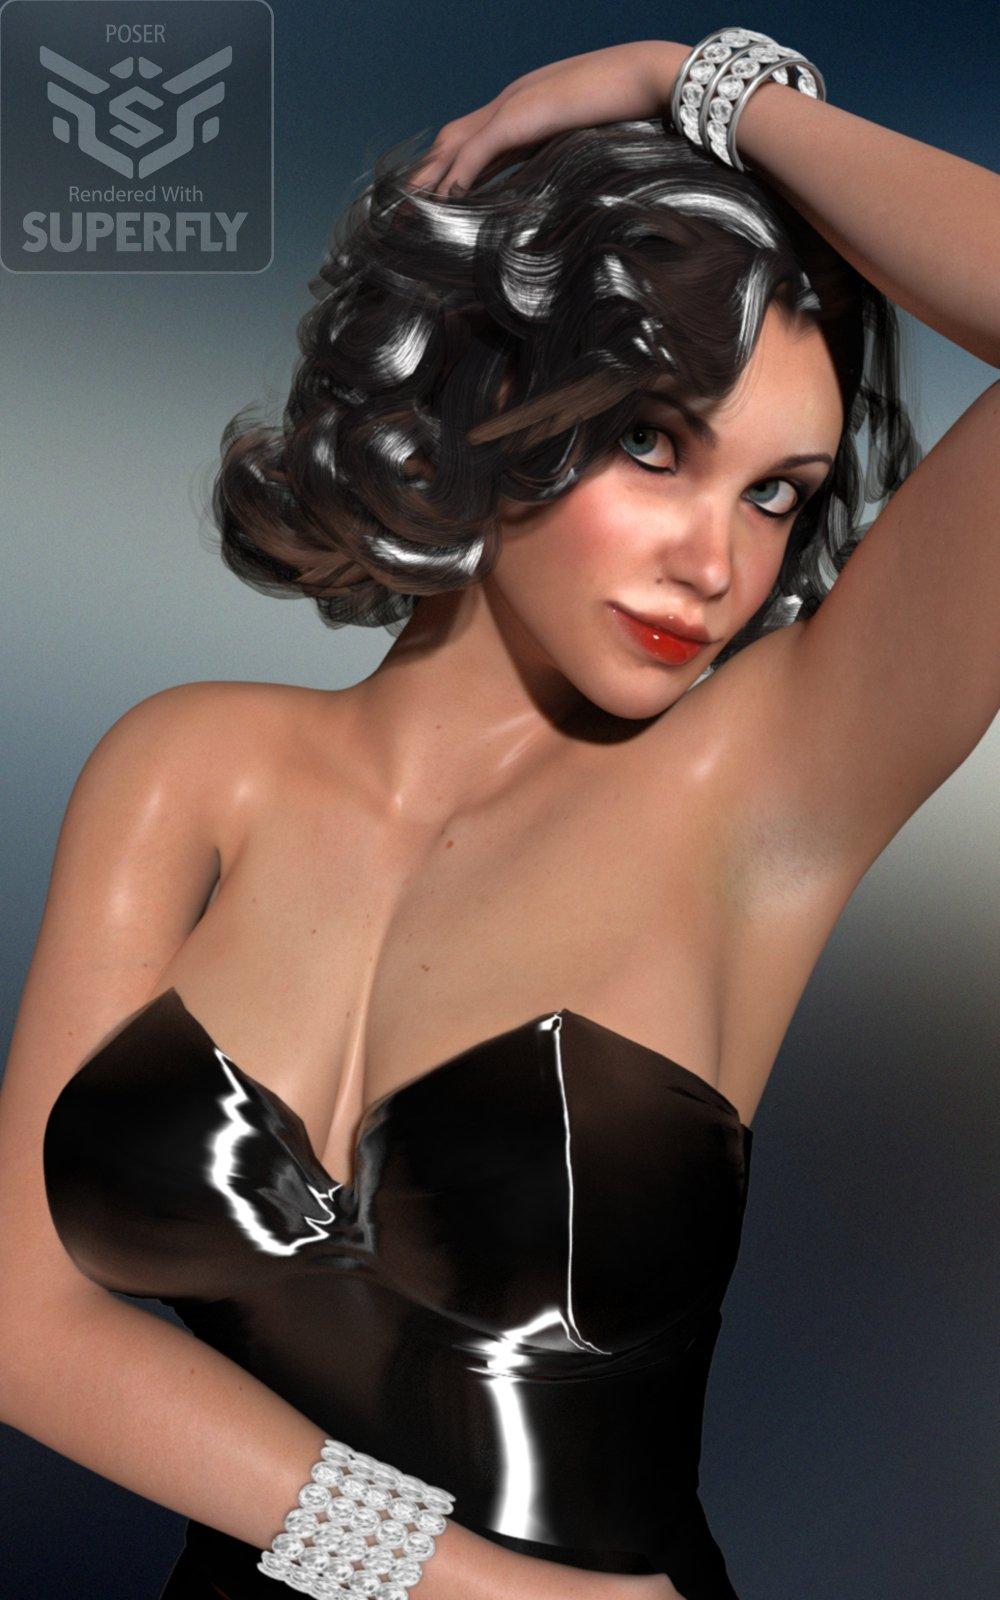 Foxy La Femme_DAZ3D下载站